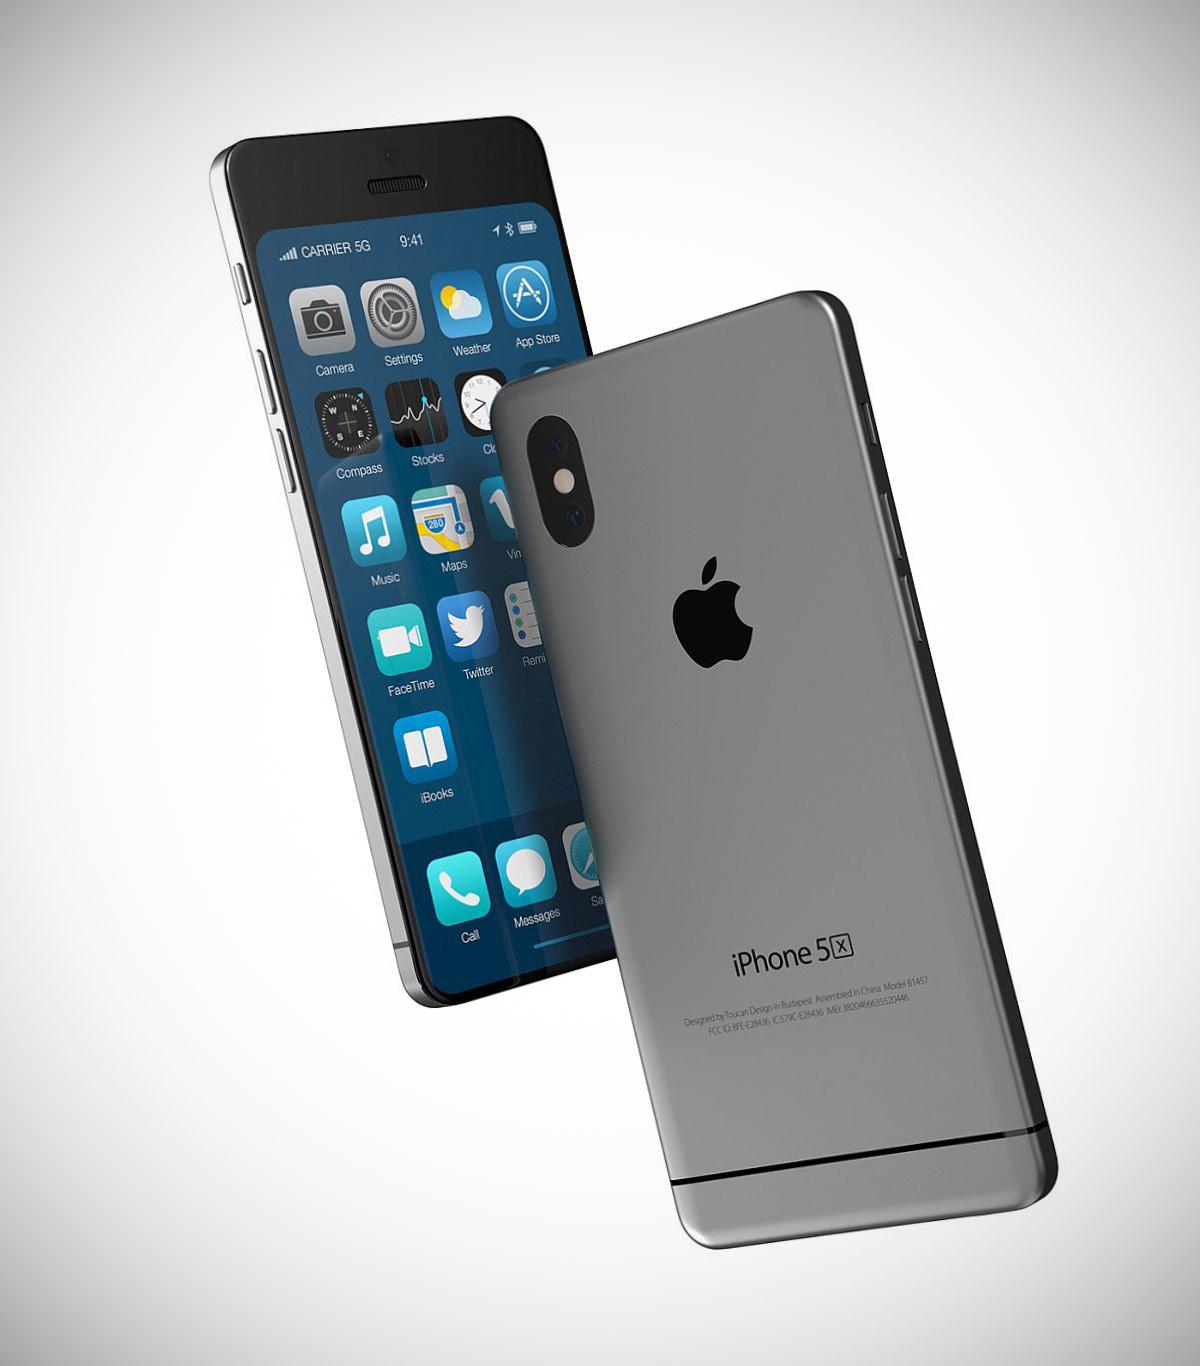 iPhone 5X